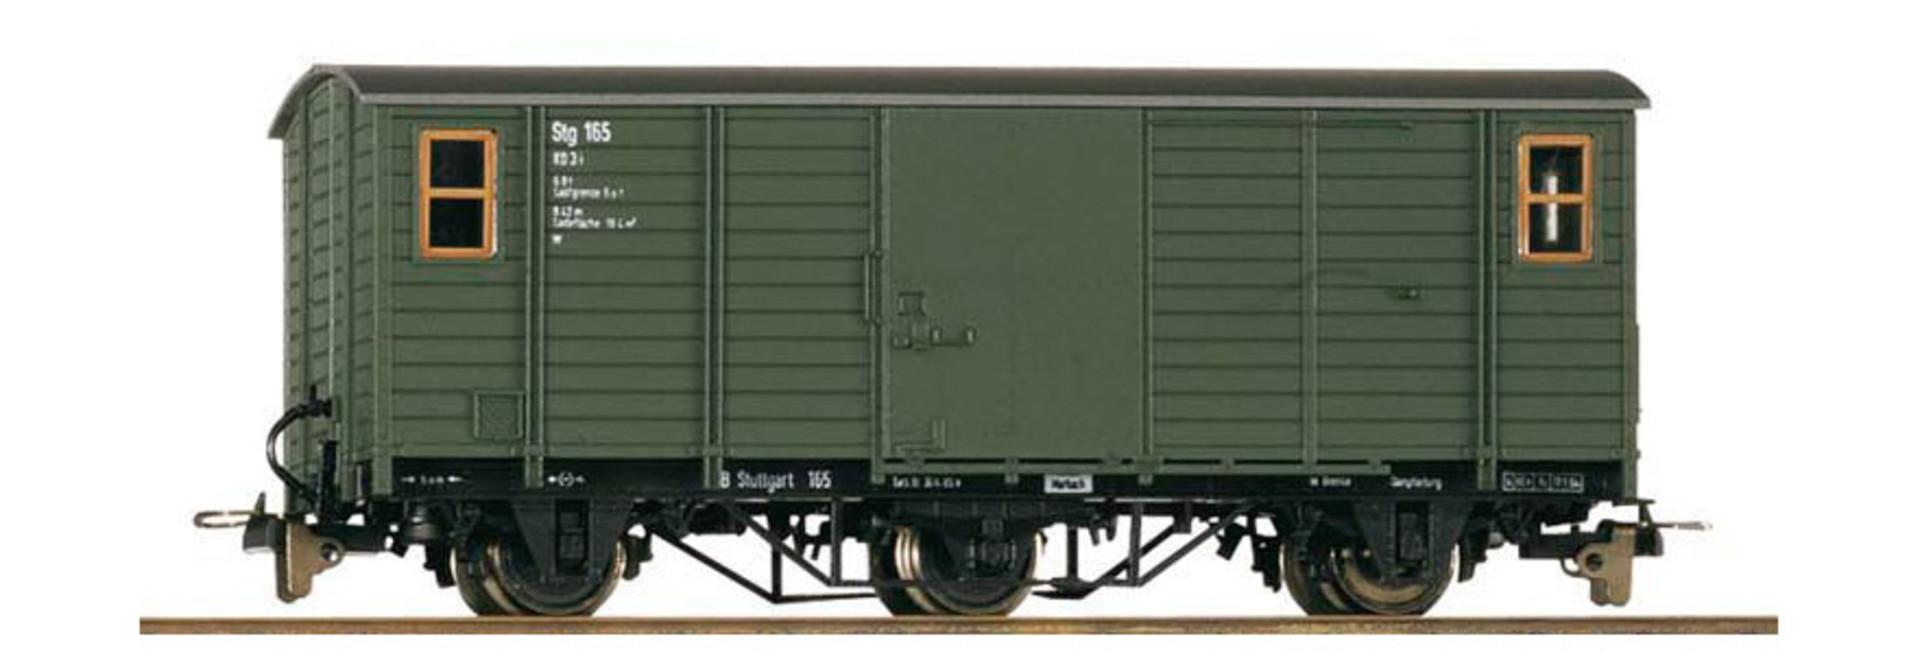 3005815 DB Stg 165 Hilfs-Post/Packwagen